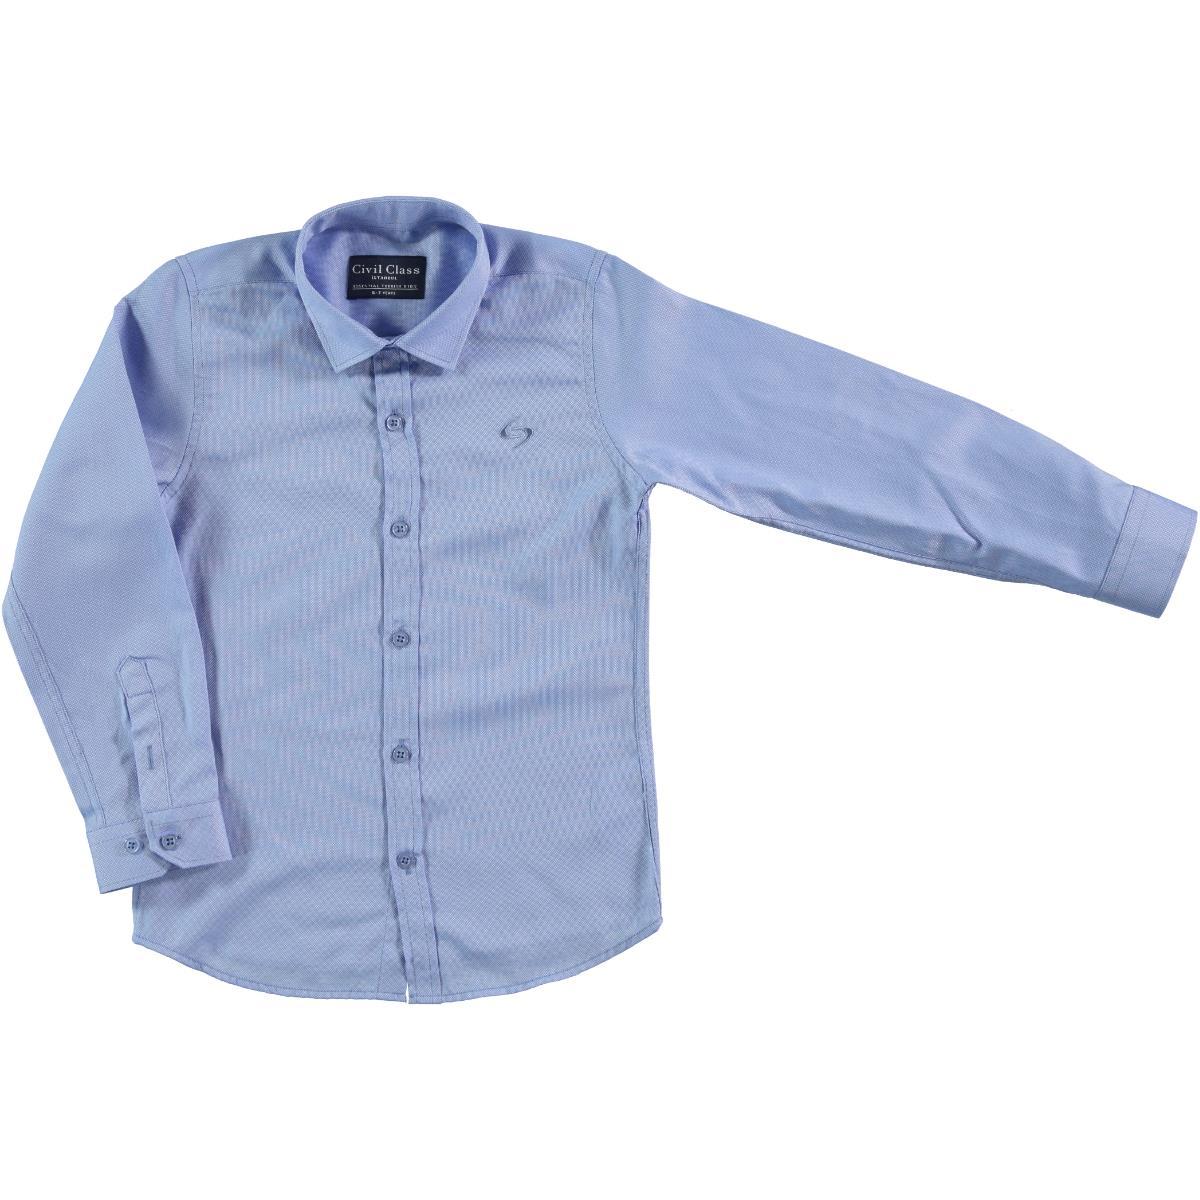 Civil Class Age 6-9 Boy Blue Shirt